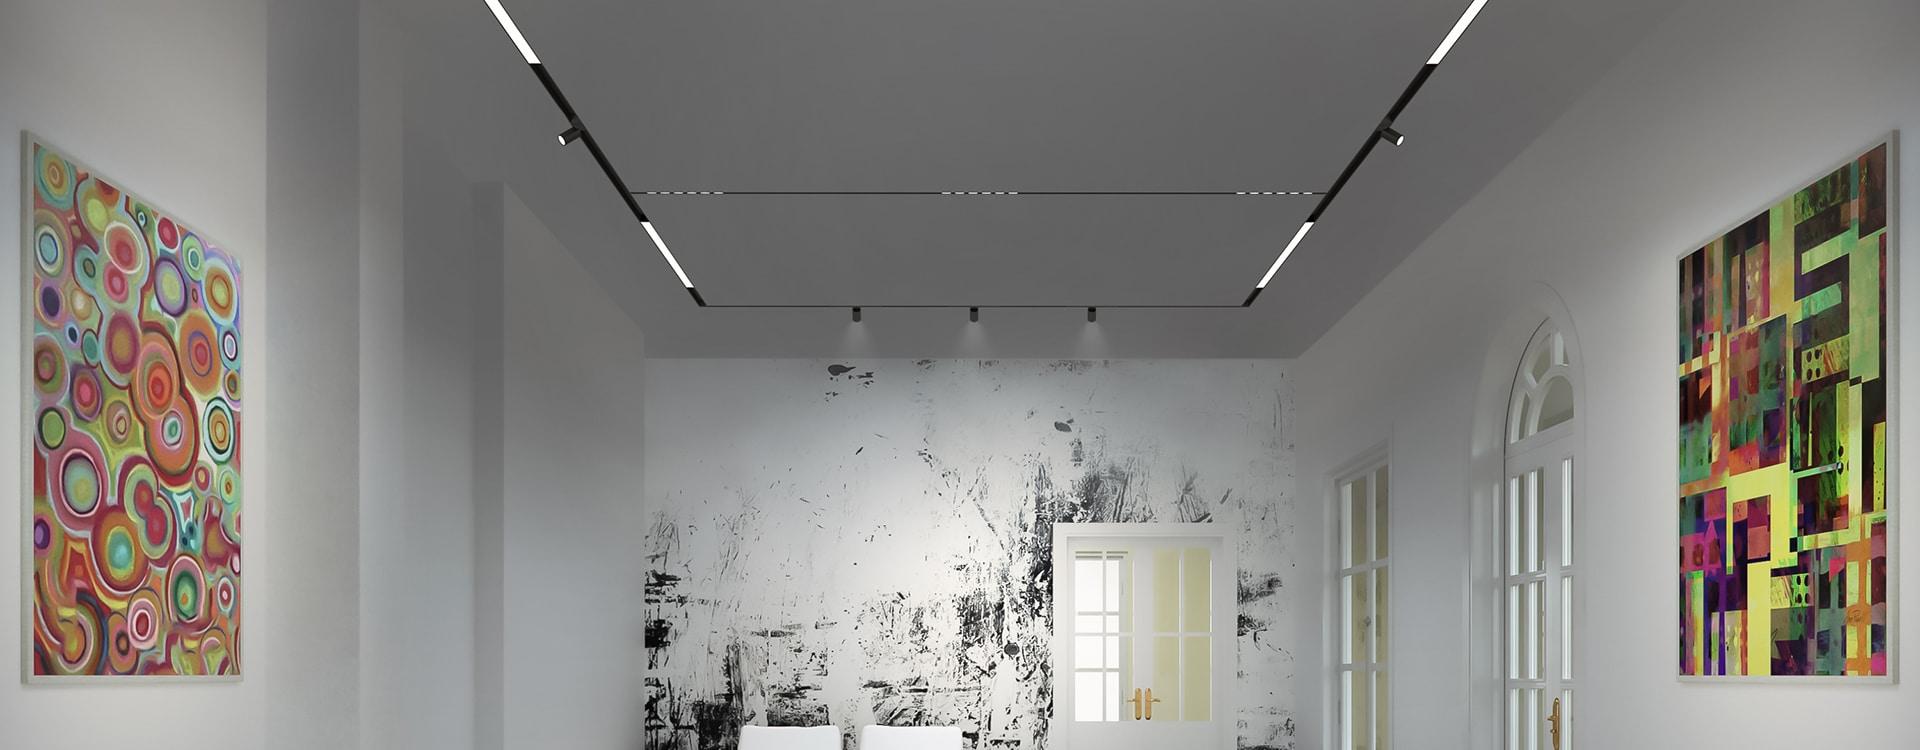 MAGNETO RENDER gallery hero